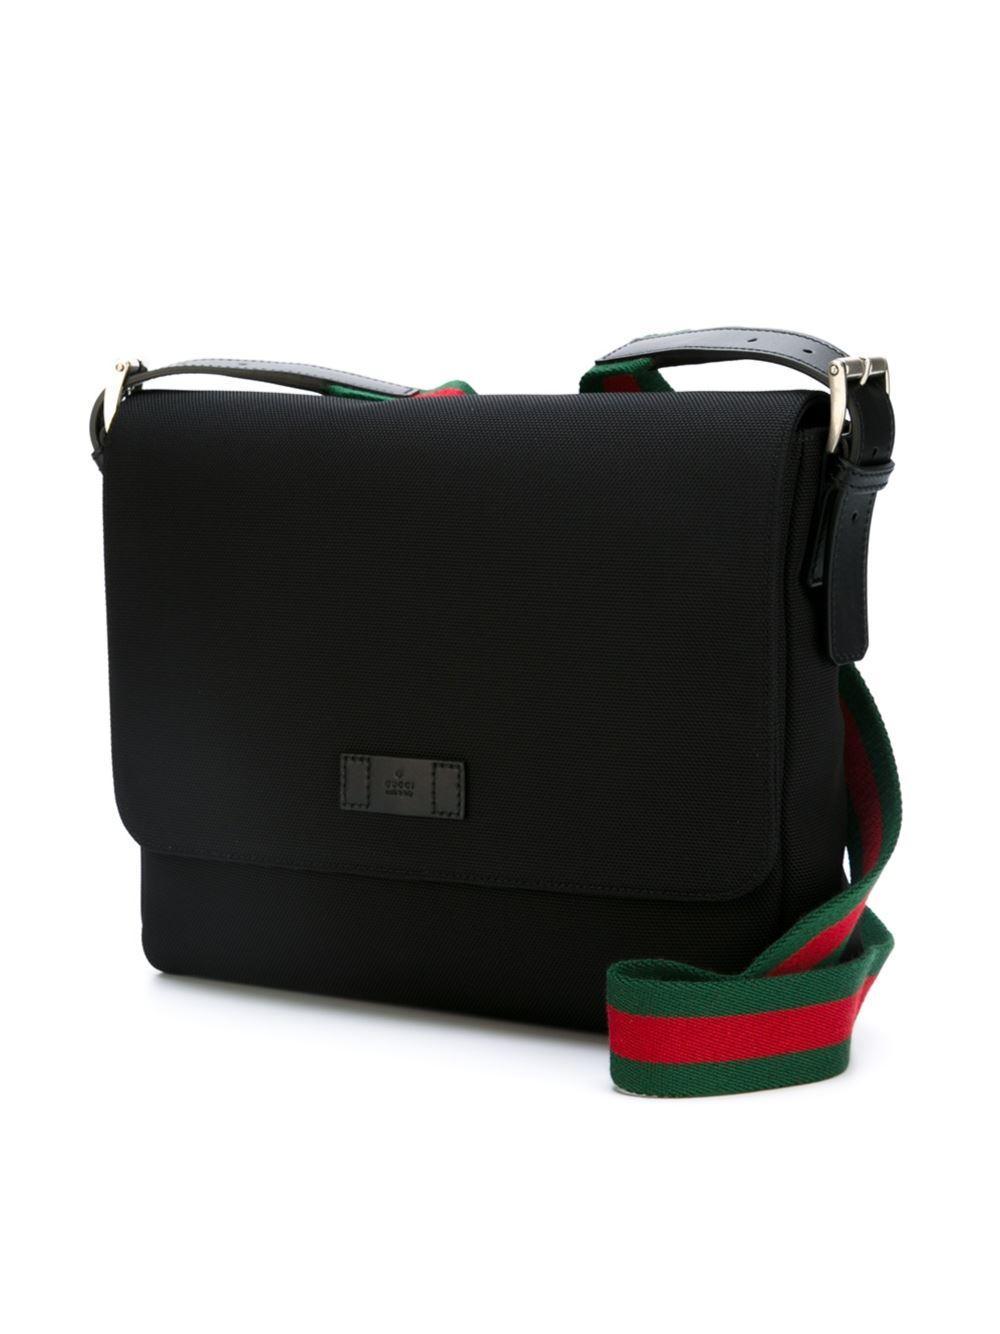 Gucci Techno Messenger Bag In Black For Men Lyst